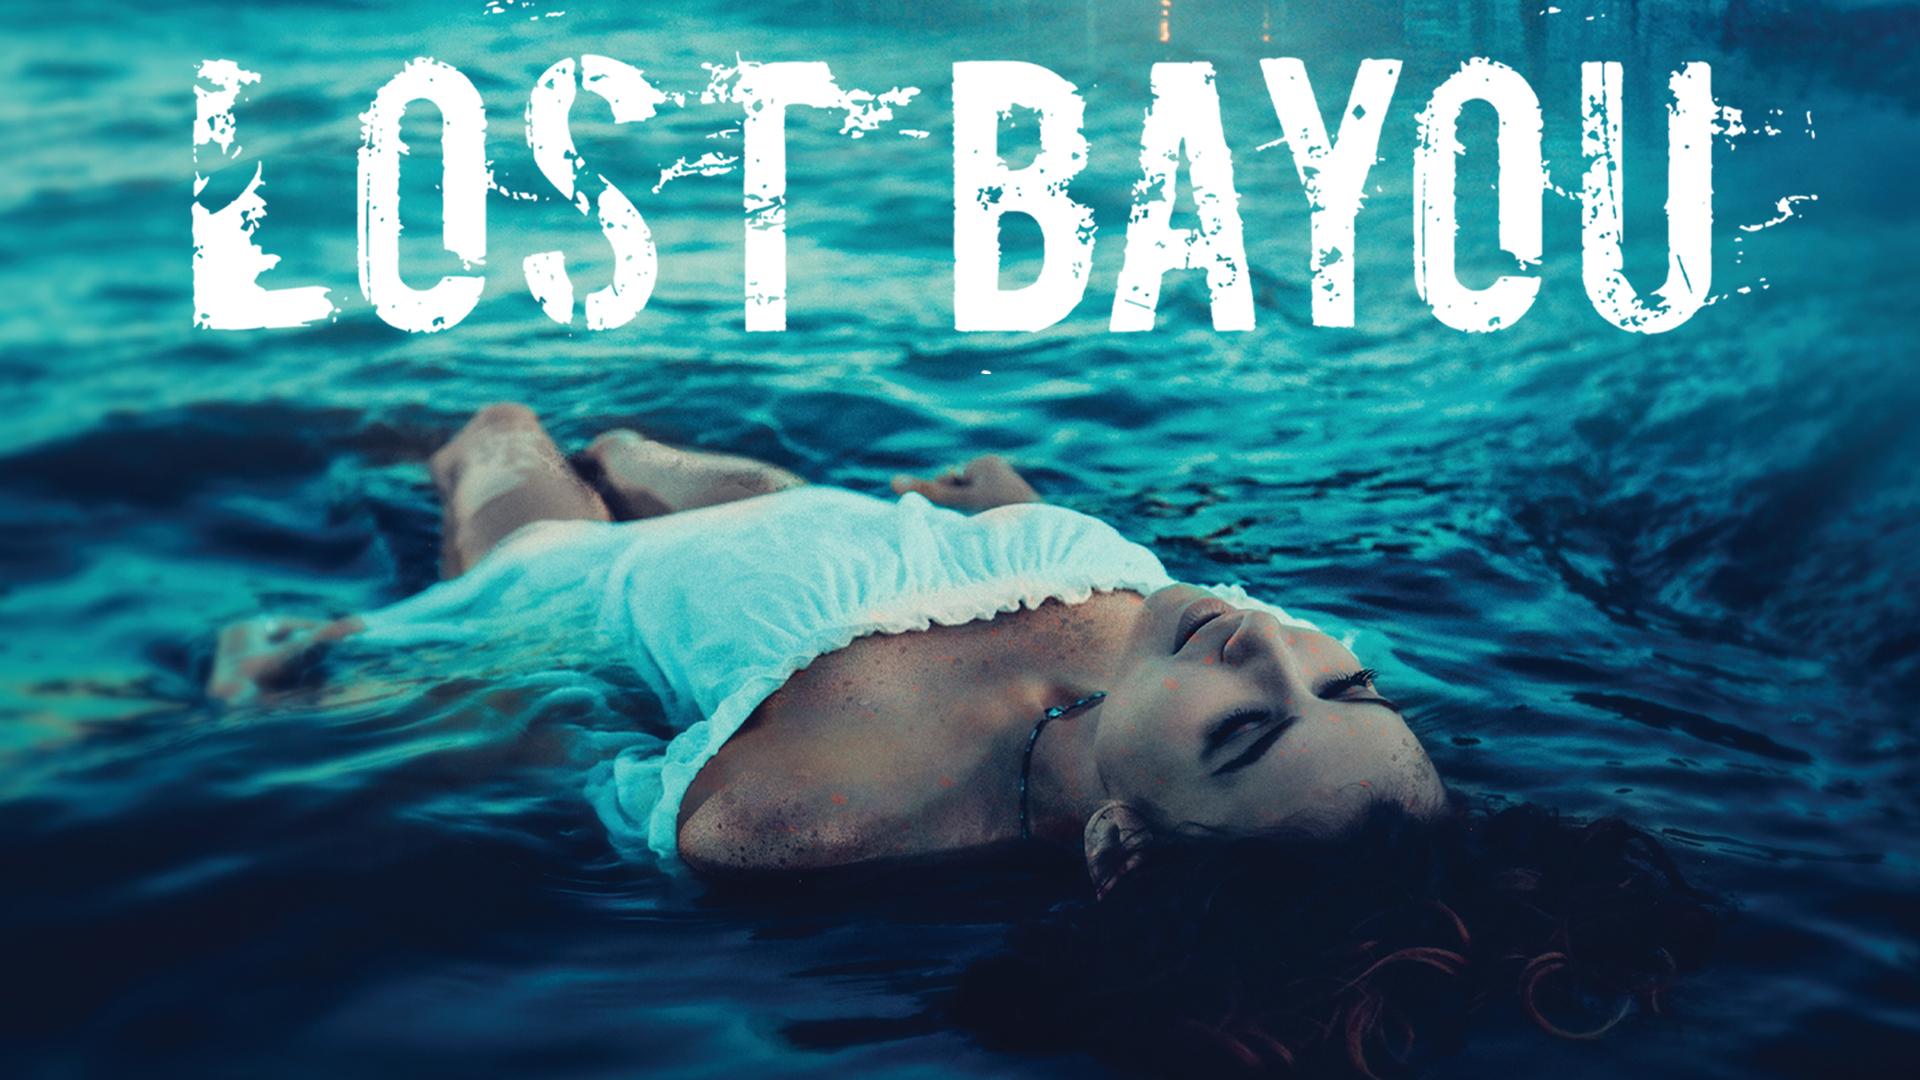 Lost Bayou